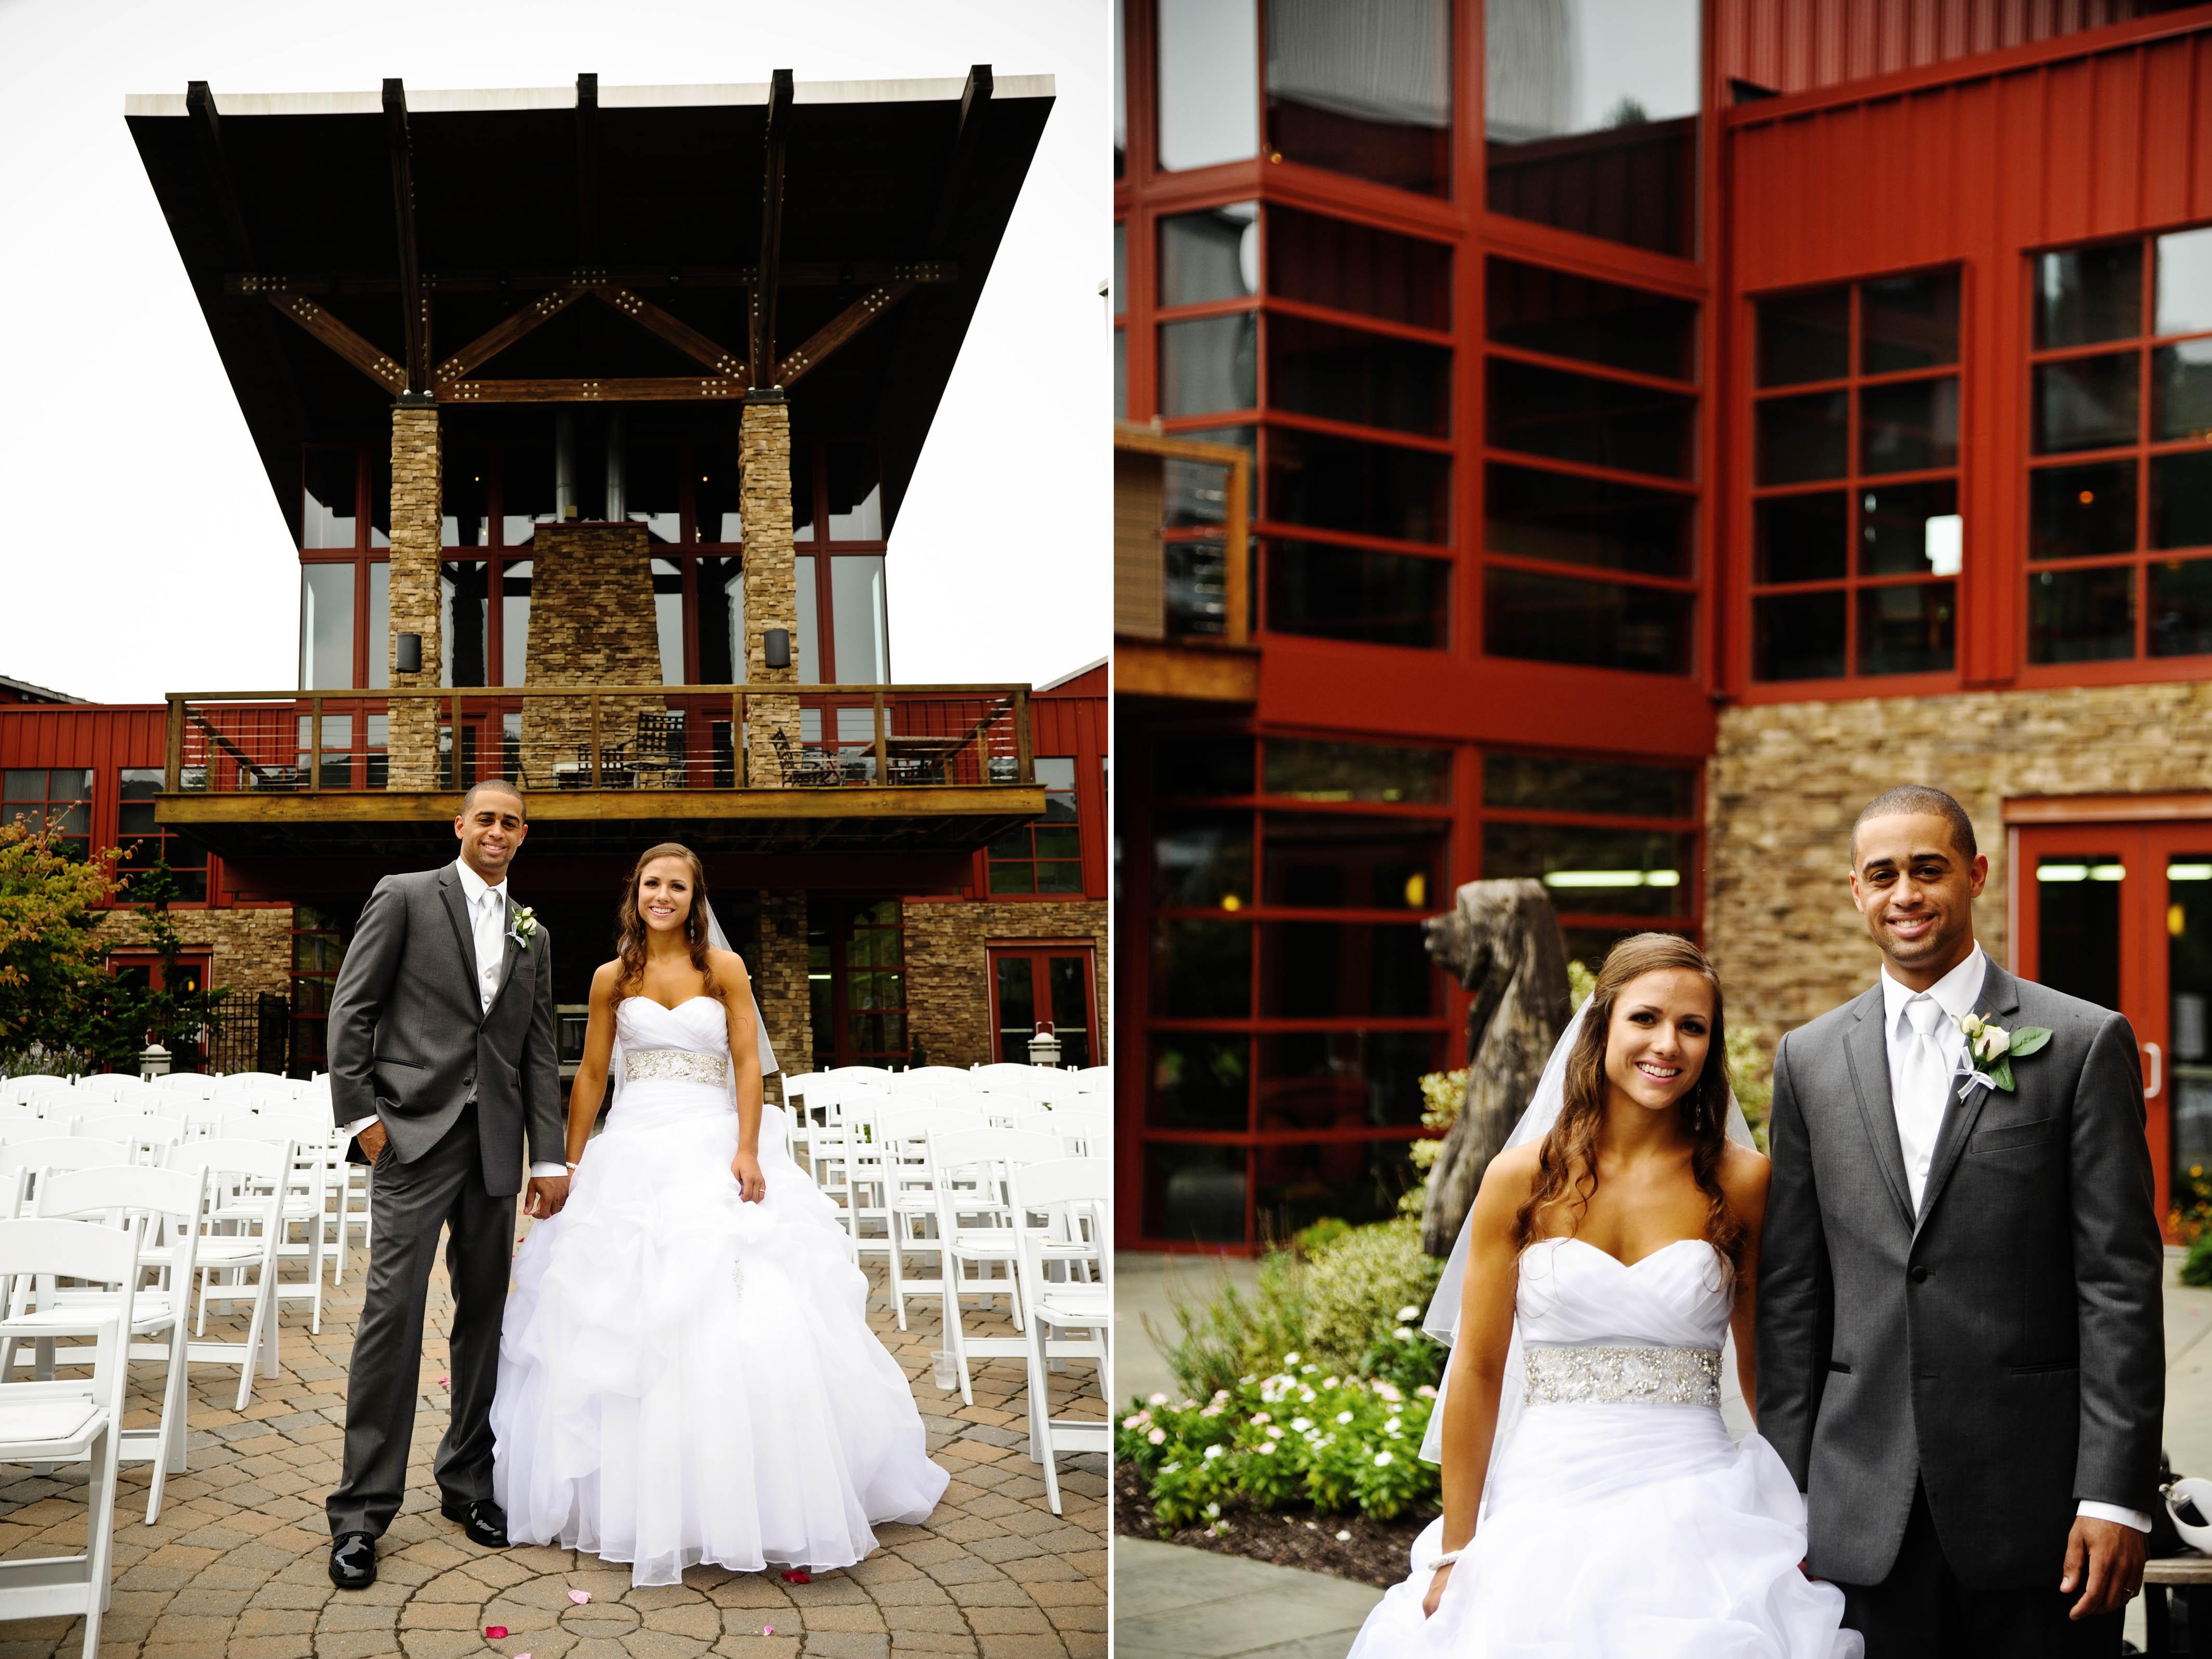 Wedding Photography Lehigh Valley: Lehigh Valley Wedding At Bear Creek Resort